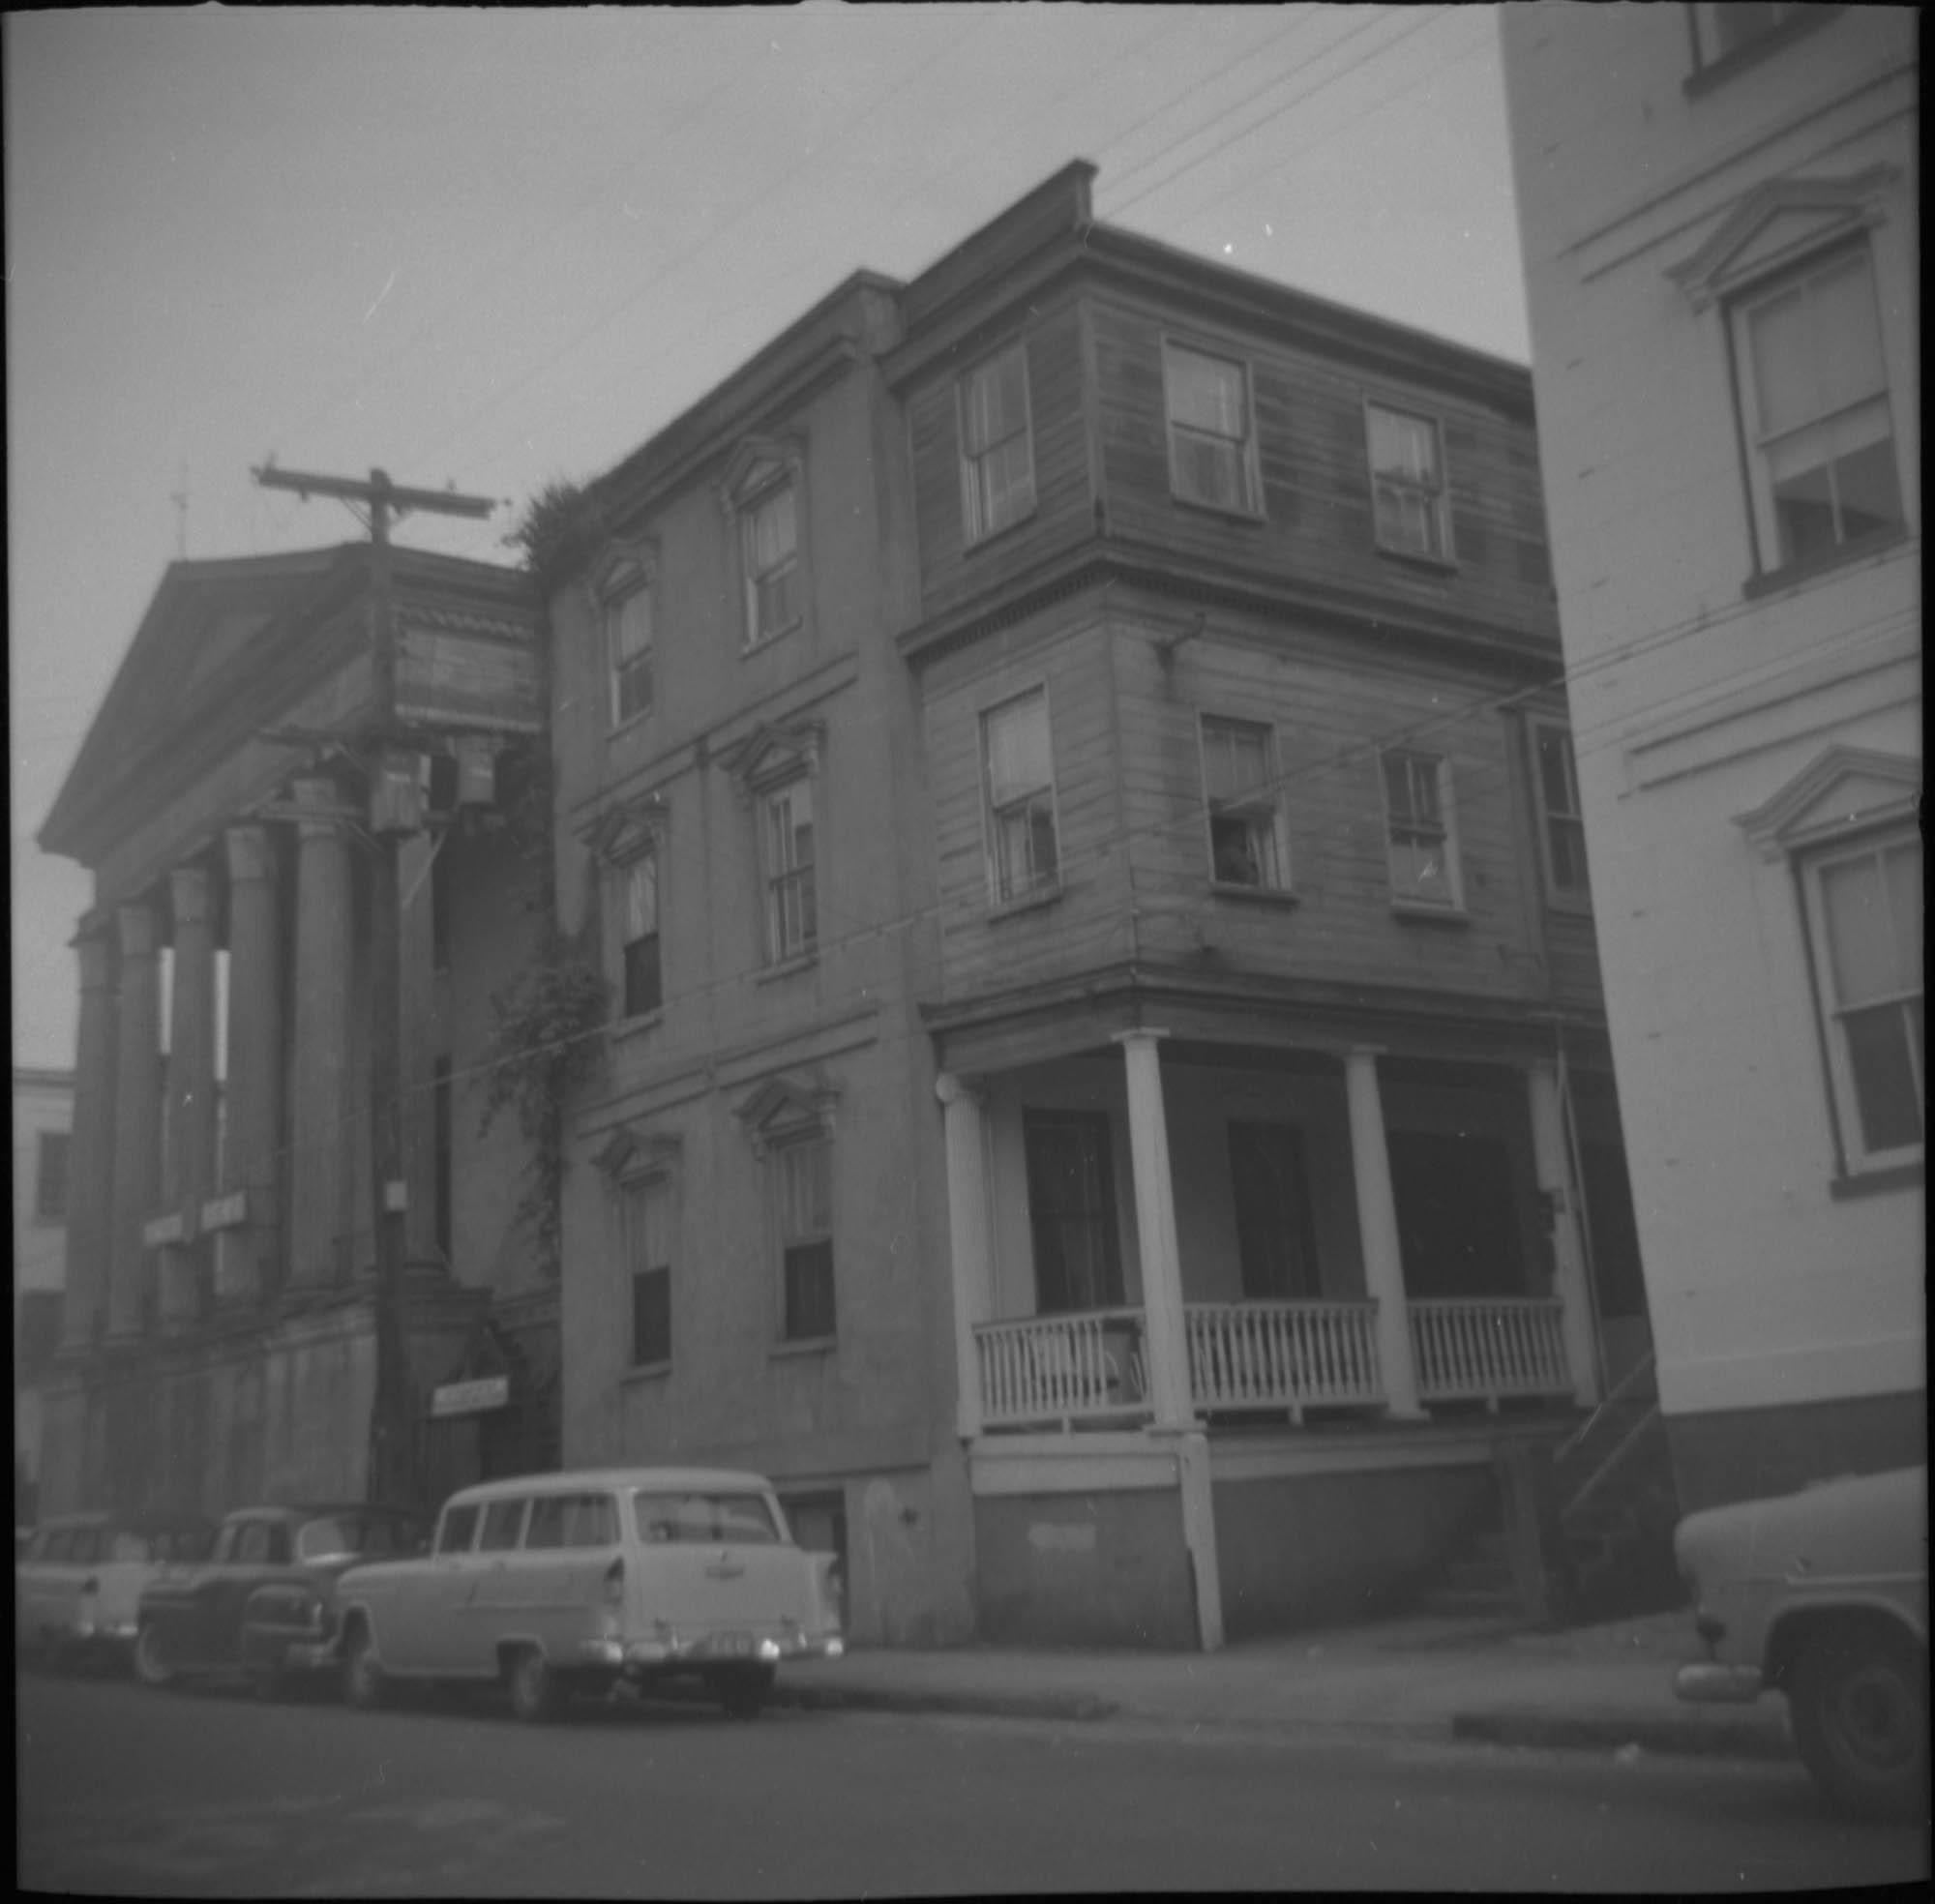 57 Society Street